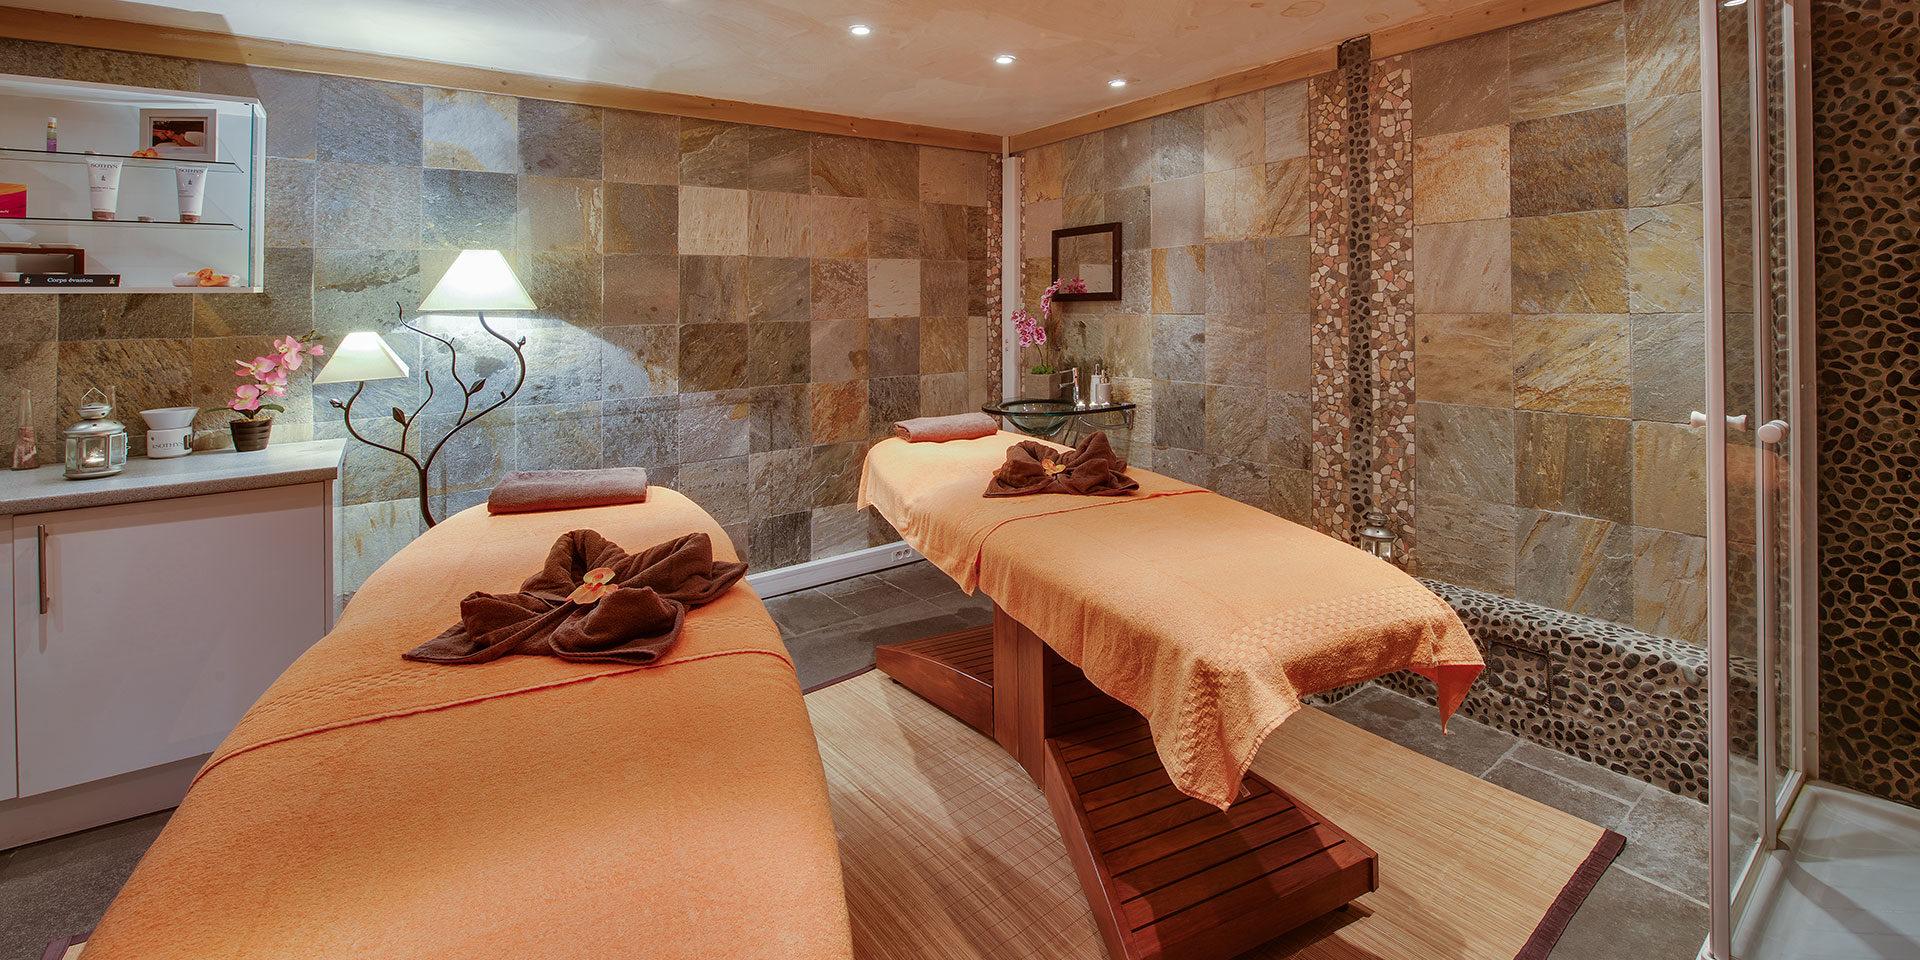 CGH Oree des Cimes Vallandry Paradiski Frankrijk wintersport skivakantie luxe Spa massage behandeling ontspannen genieten wellness